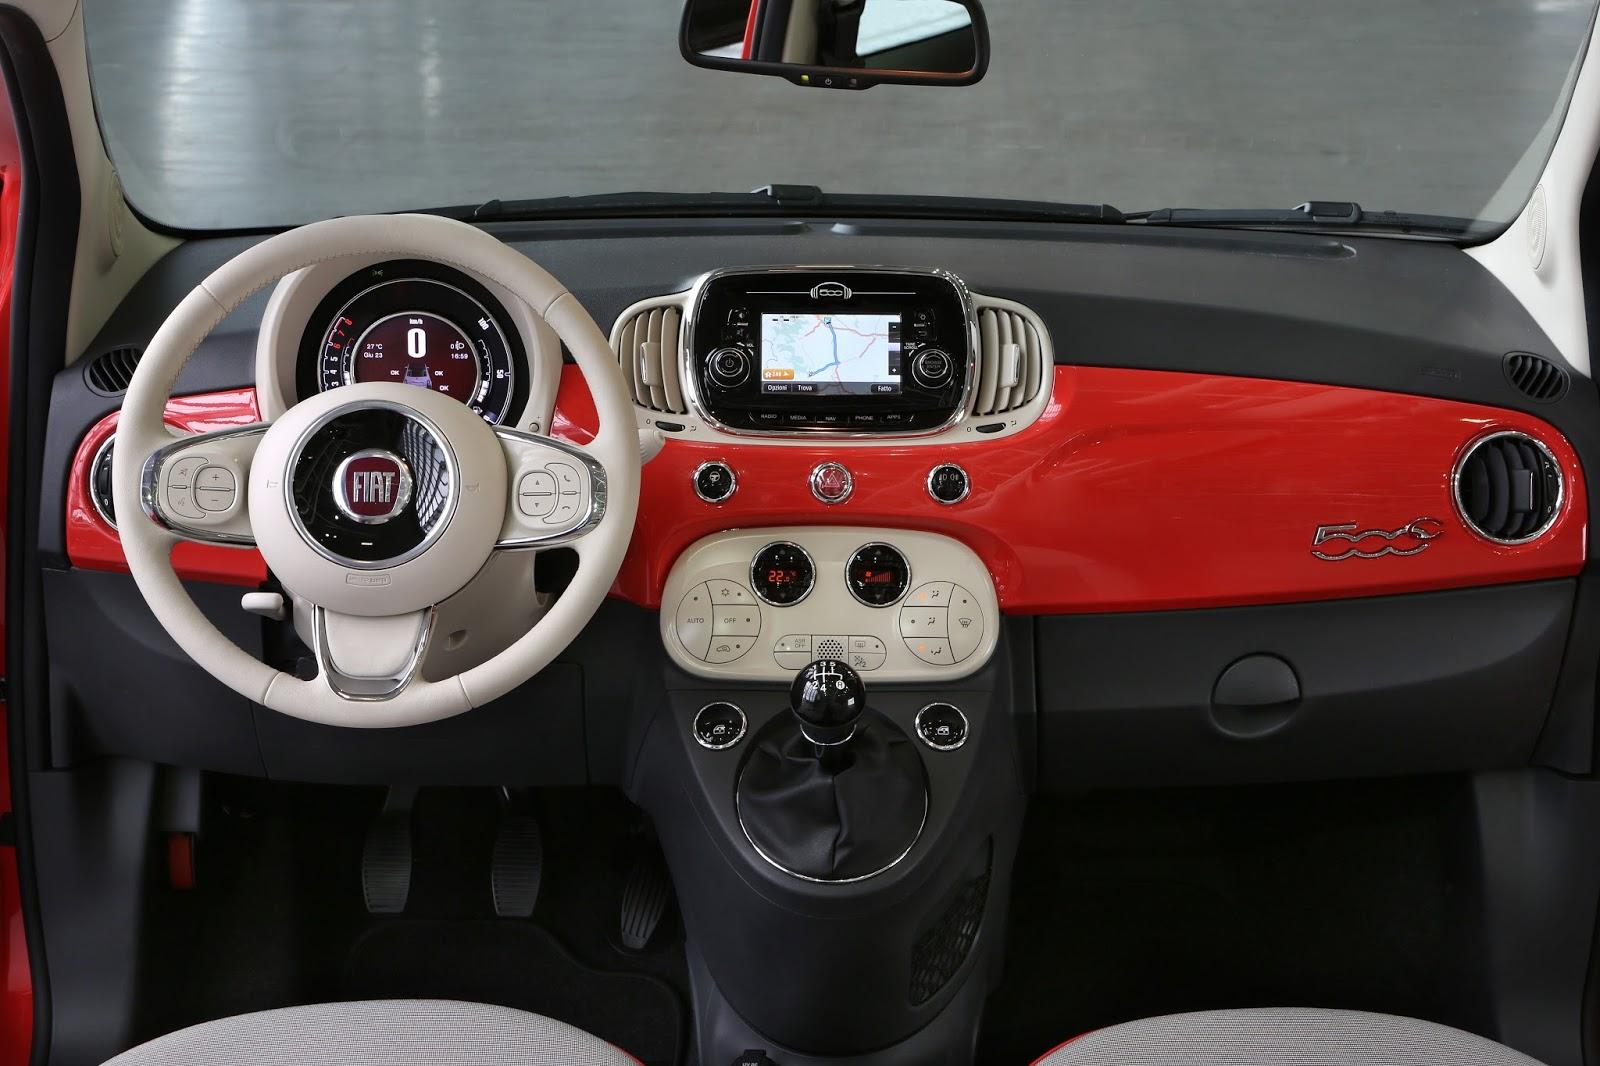 150703 FIAT Nuova 500 48 Η άφιξη του νέου Fiat 500 είναι γεγονός